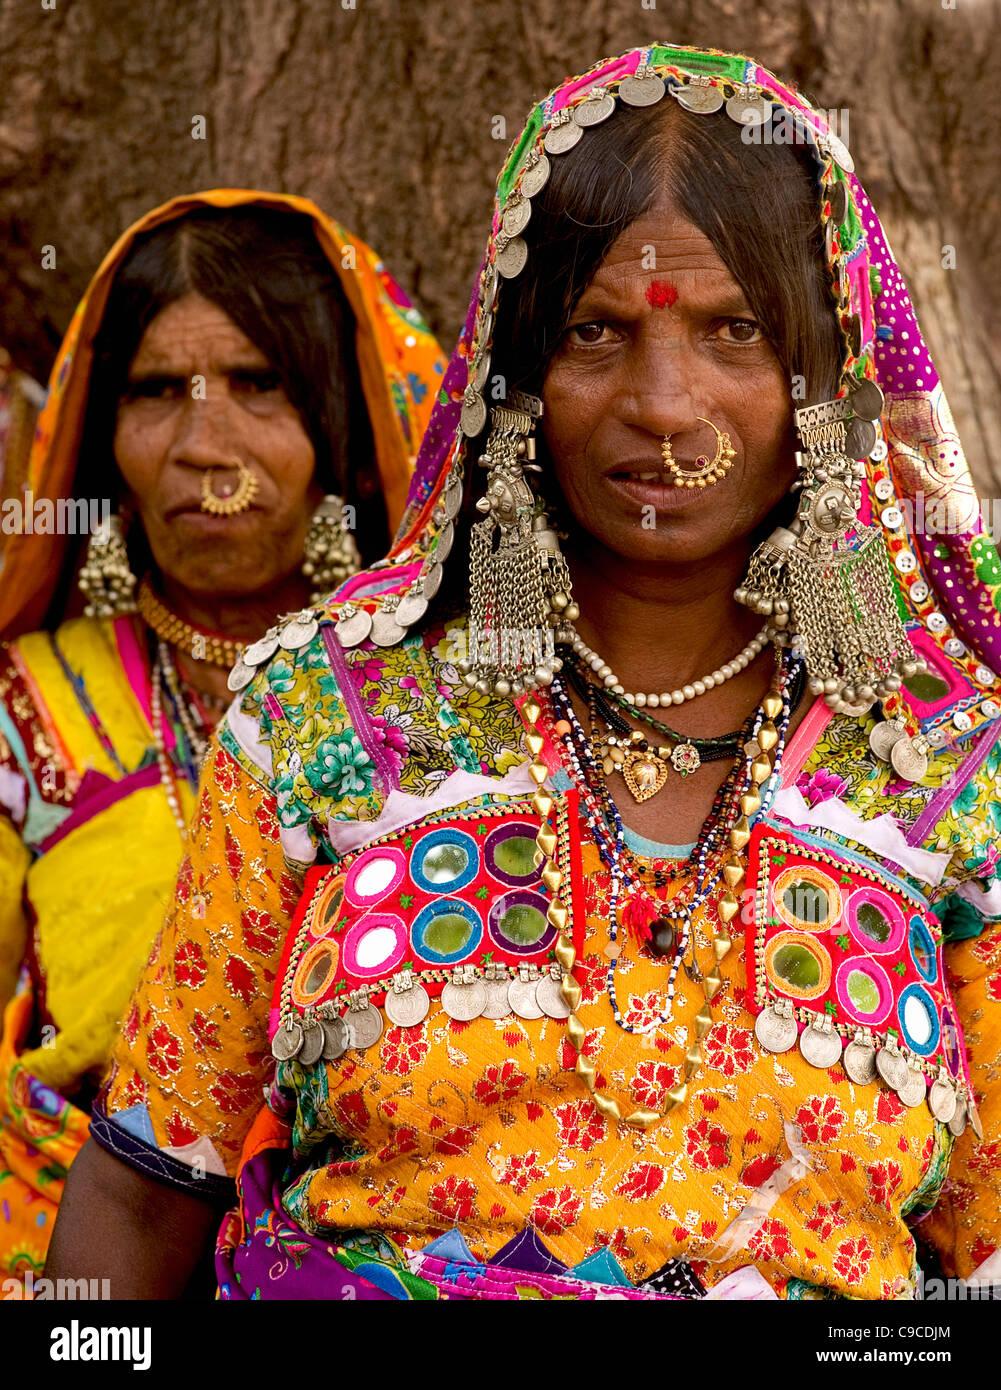 India, South Asia, Karnataka, Lambani Gypsy women. Tribal forest dwellers,  now settled in 30-home rural hamlets Stock Photo - Alamy